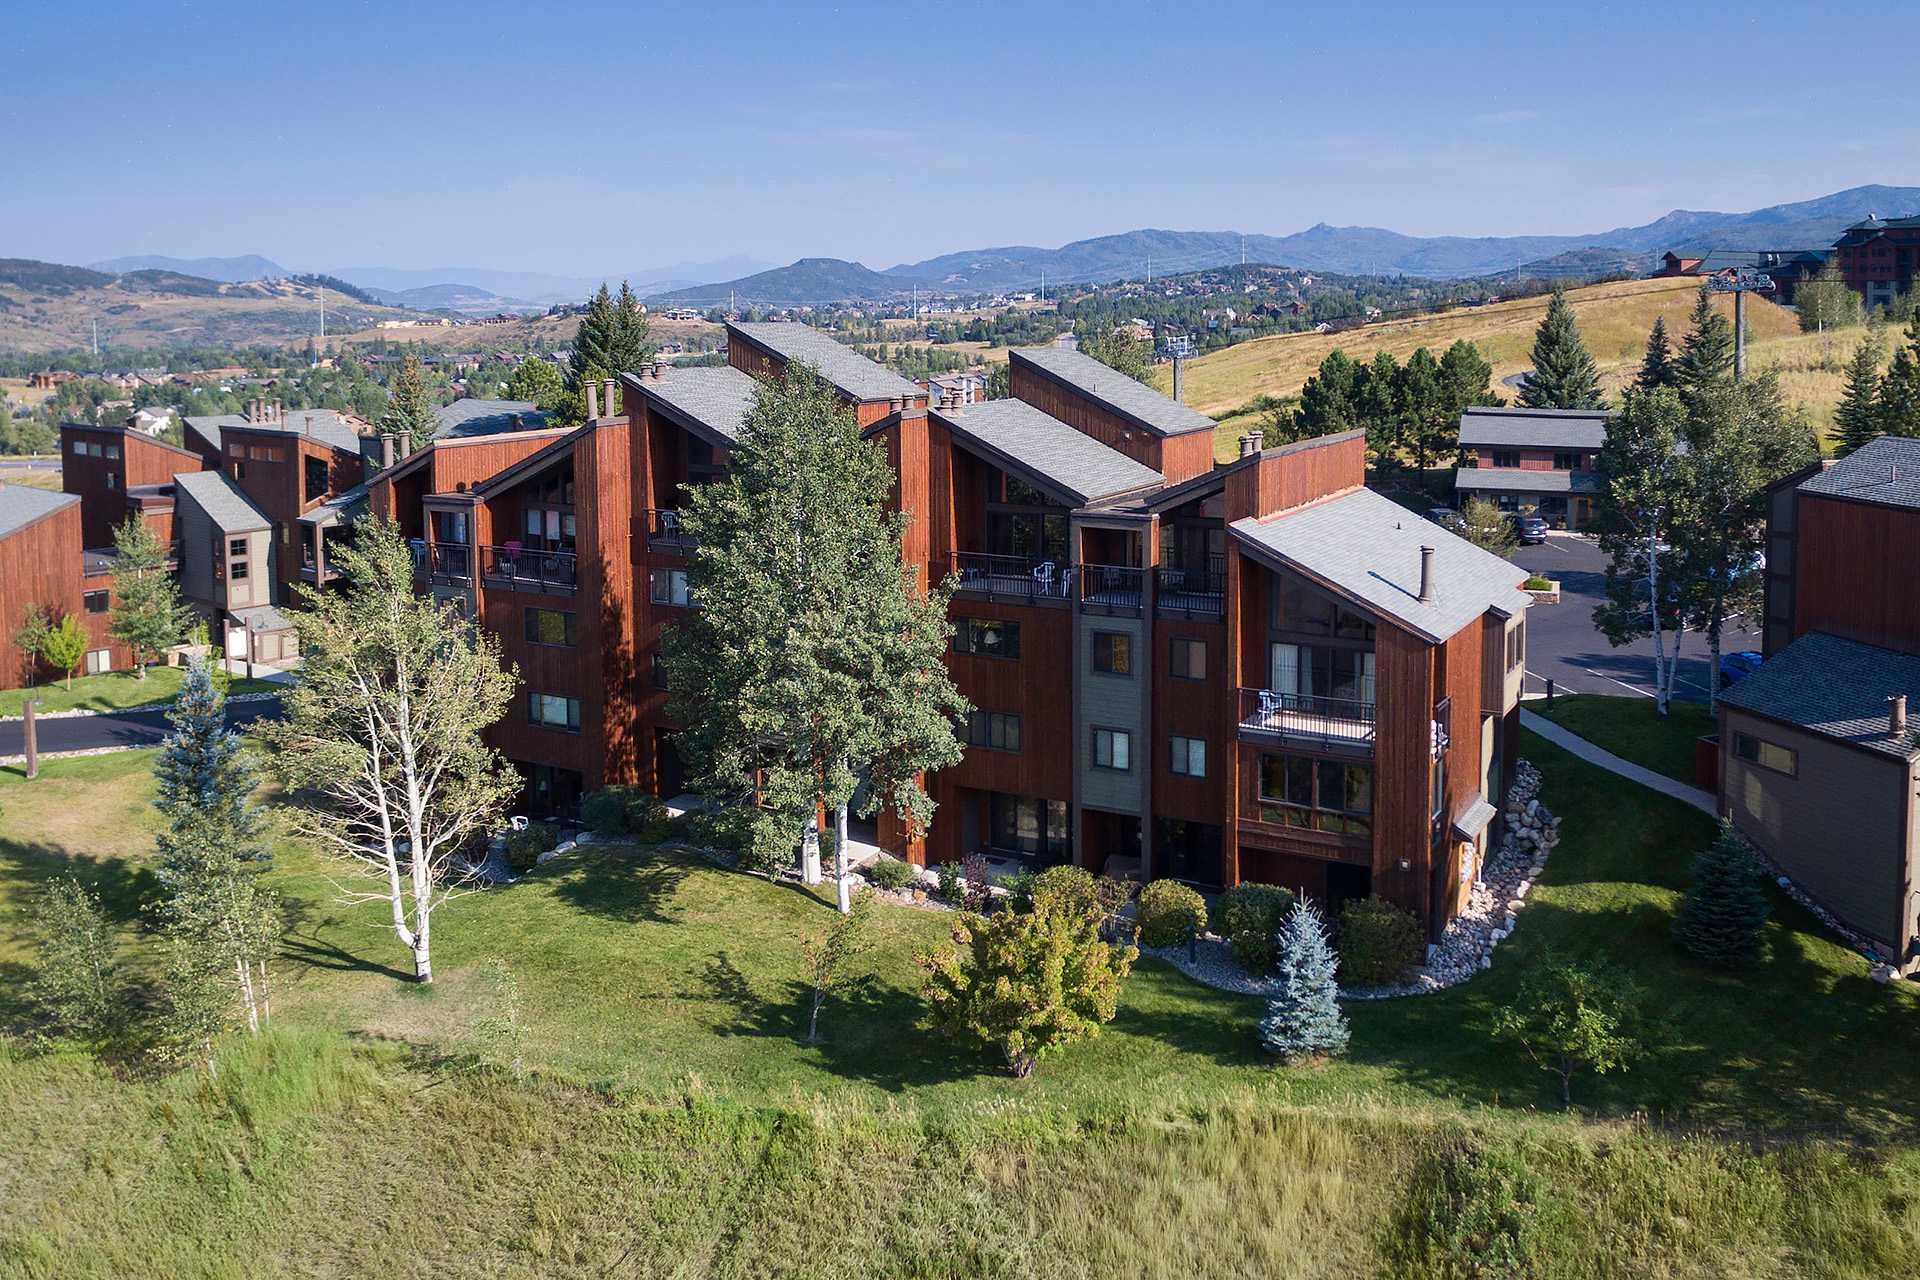 W3531: The West Condominiums